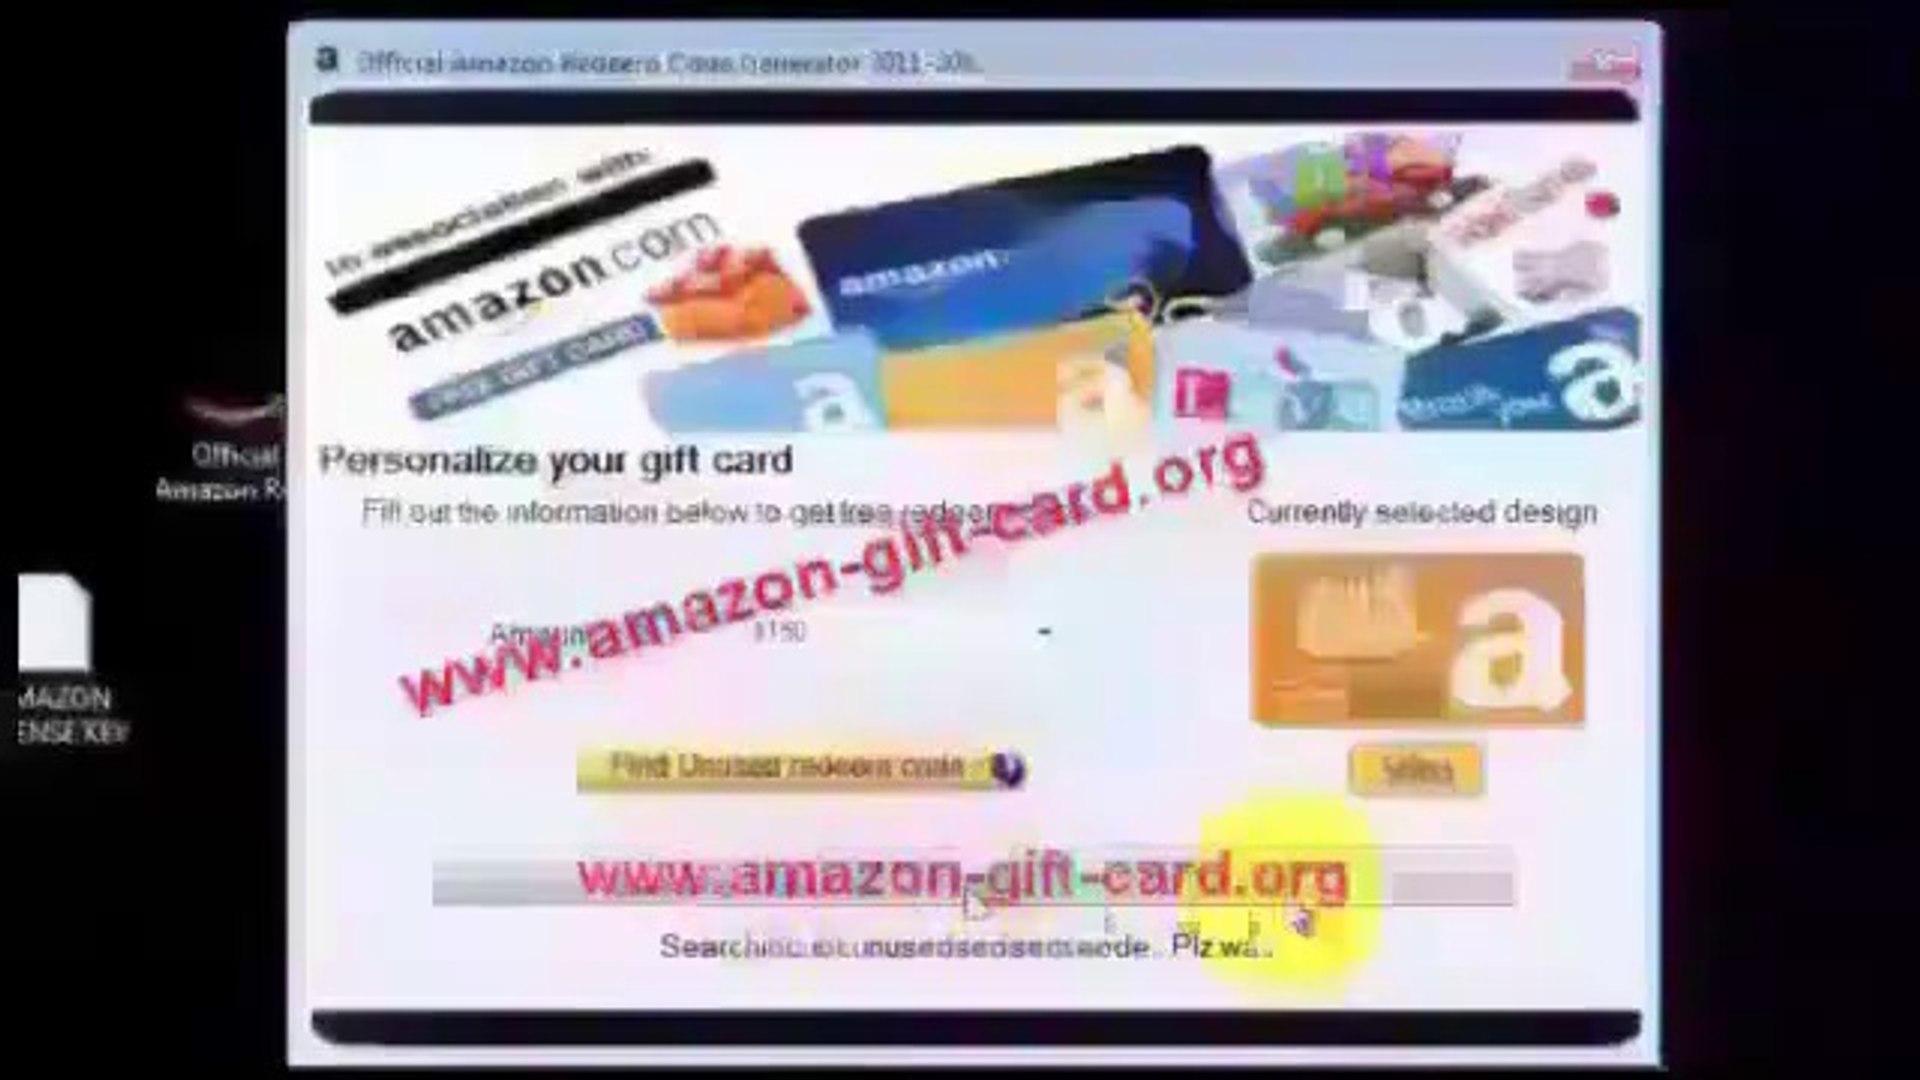 Amazon Gift Card Generator Working, Amazon Gift Code Hack, How To Get Free Amazon Gift Cards